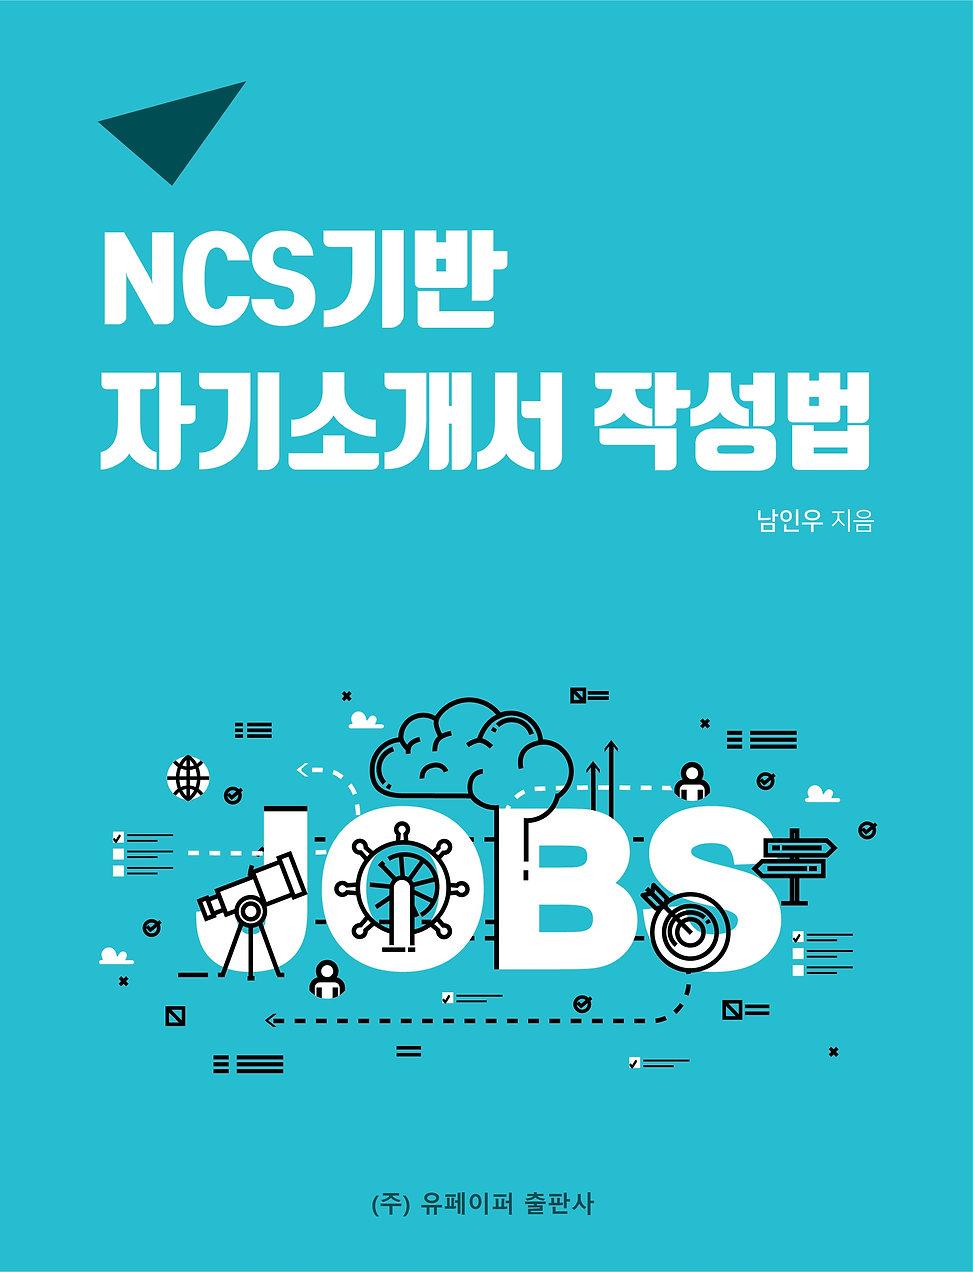 NCS기반 자기소개서 작성법.jpg